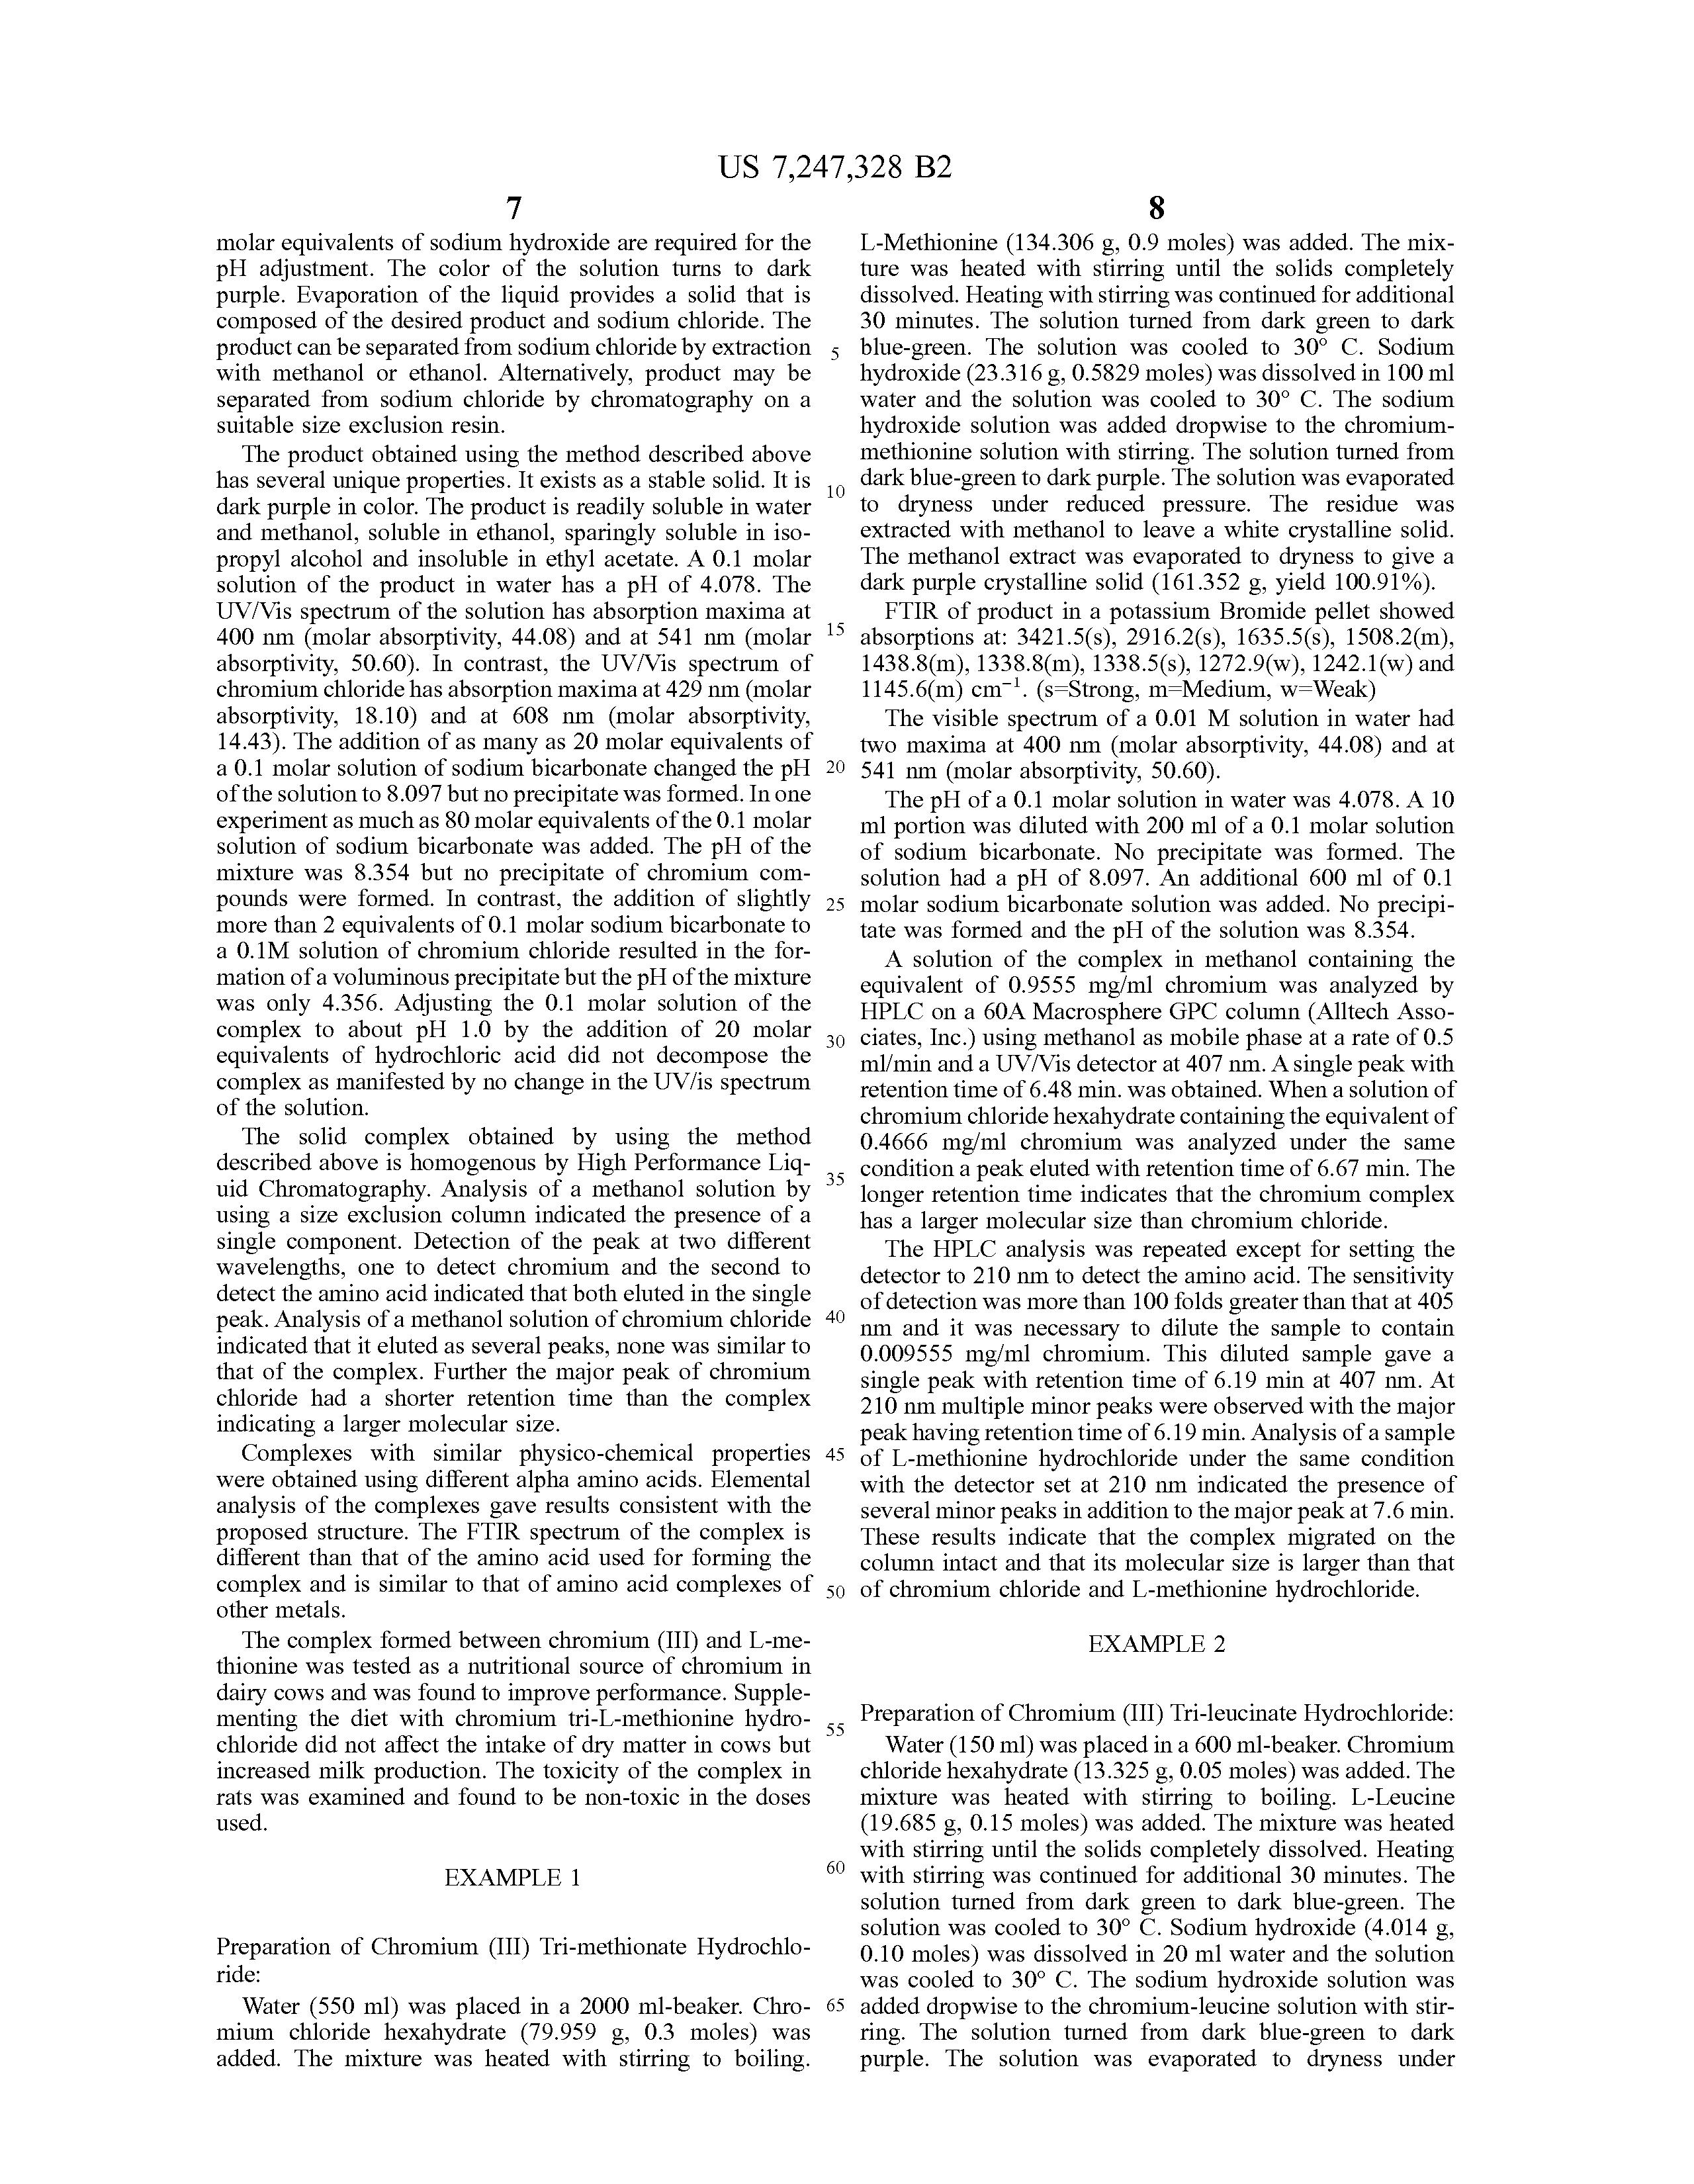 Patent US7247328 - Chromium (III) alpha amino acid complexes ...